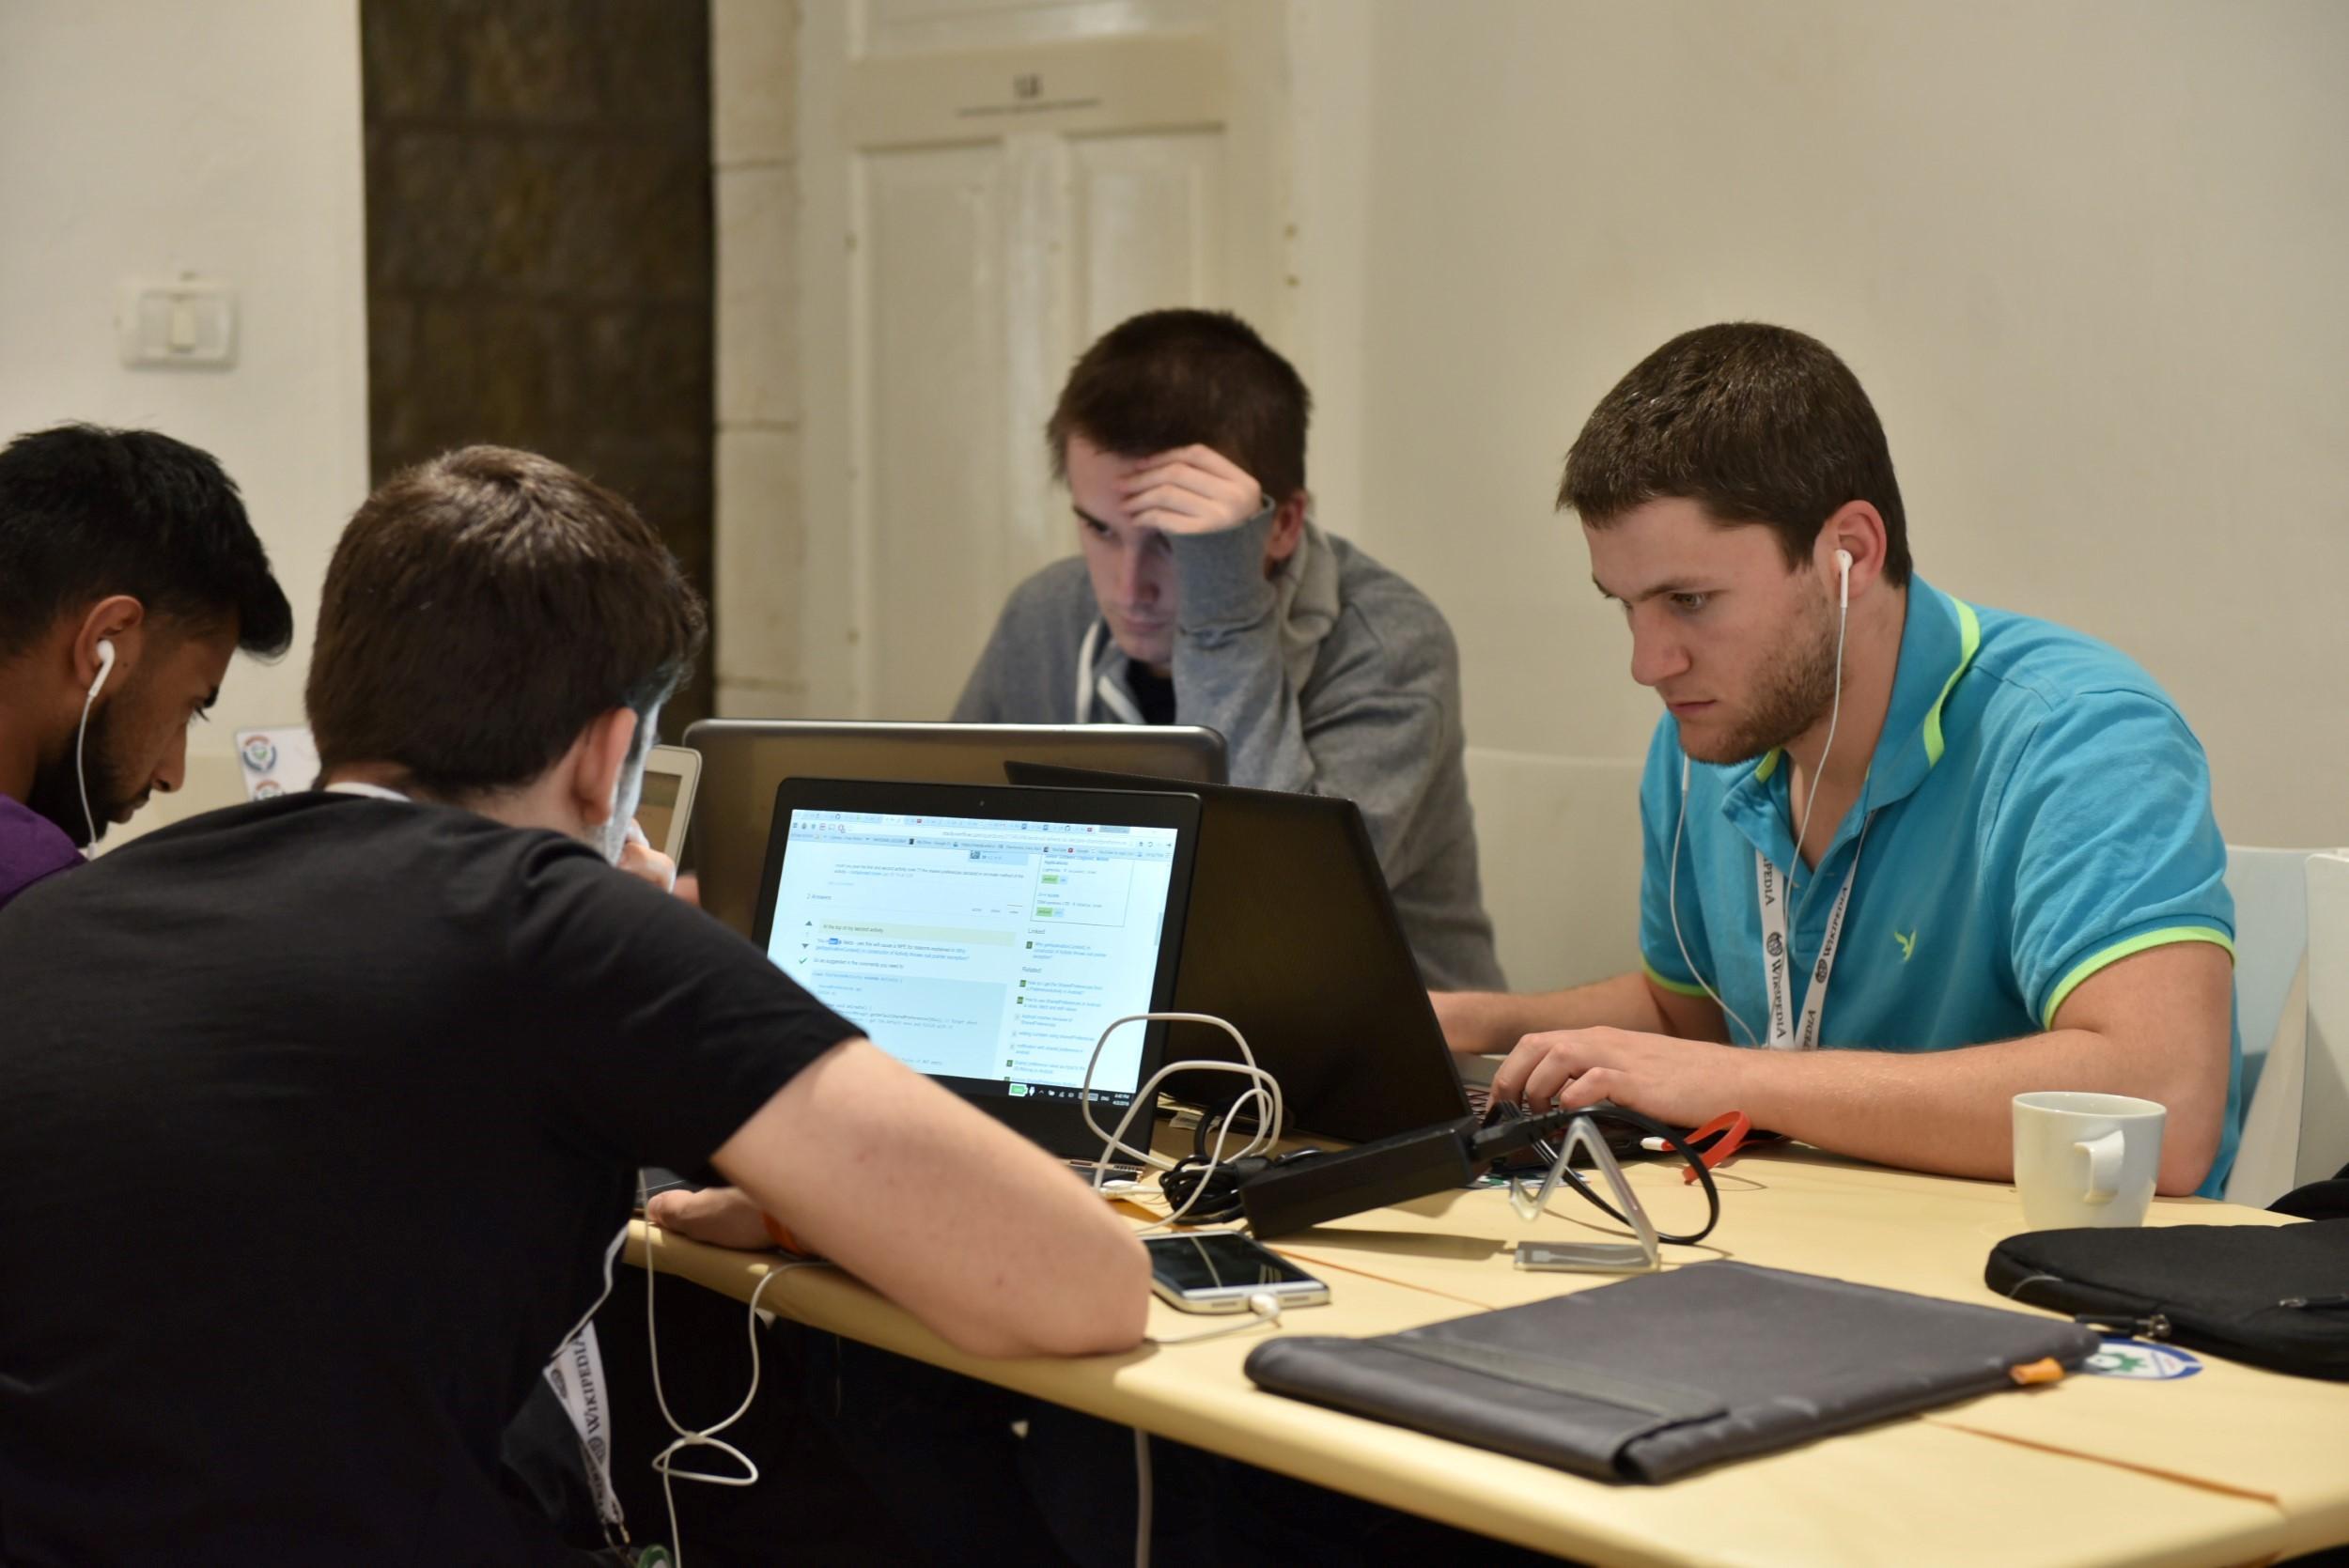 hackathon-wikimedia (3)